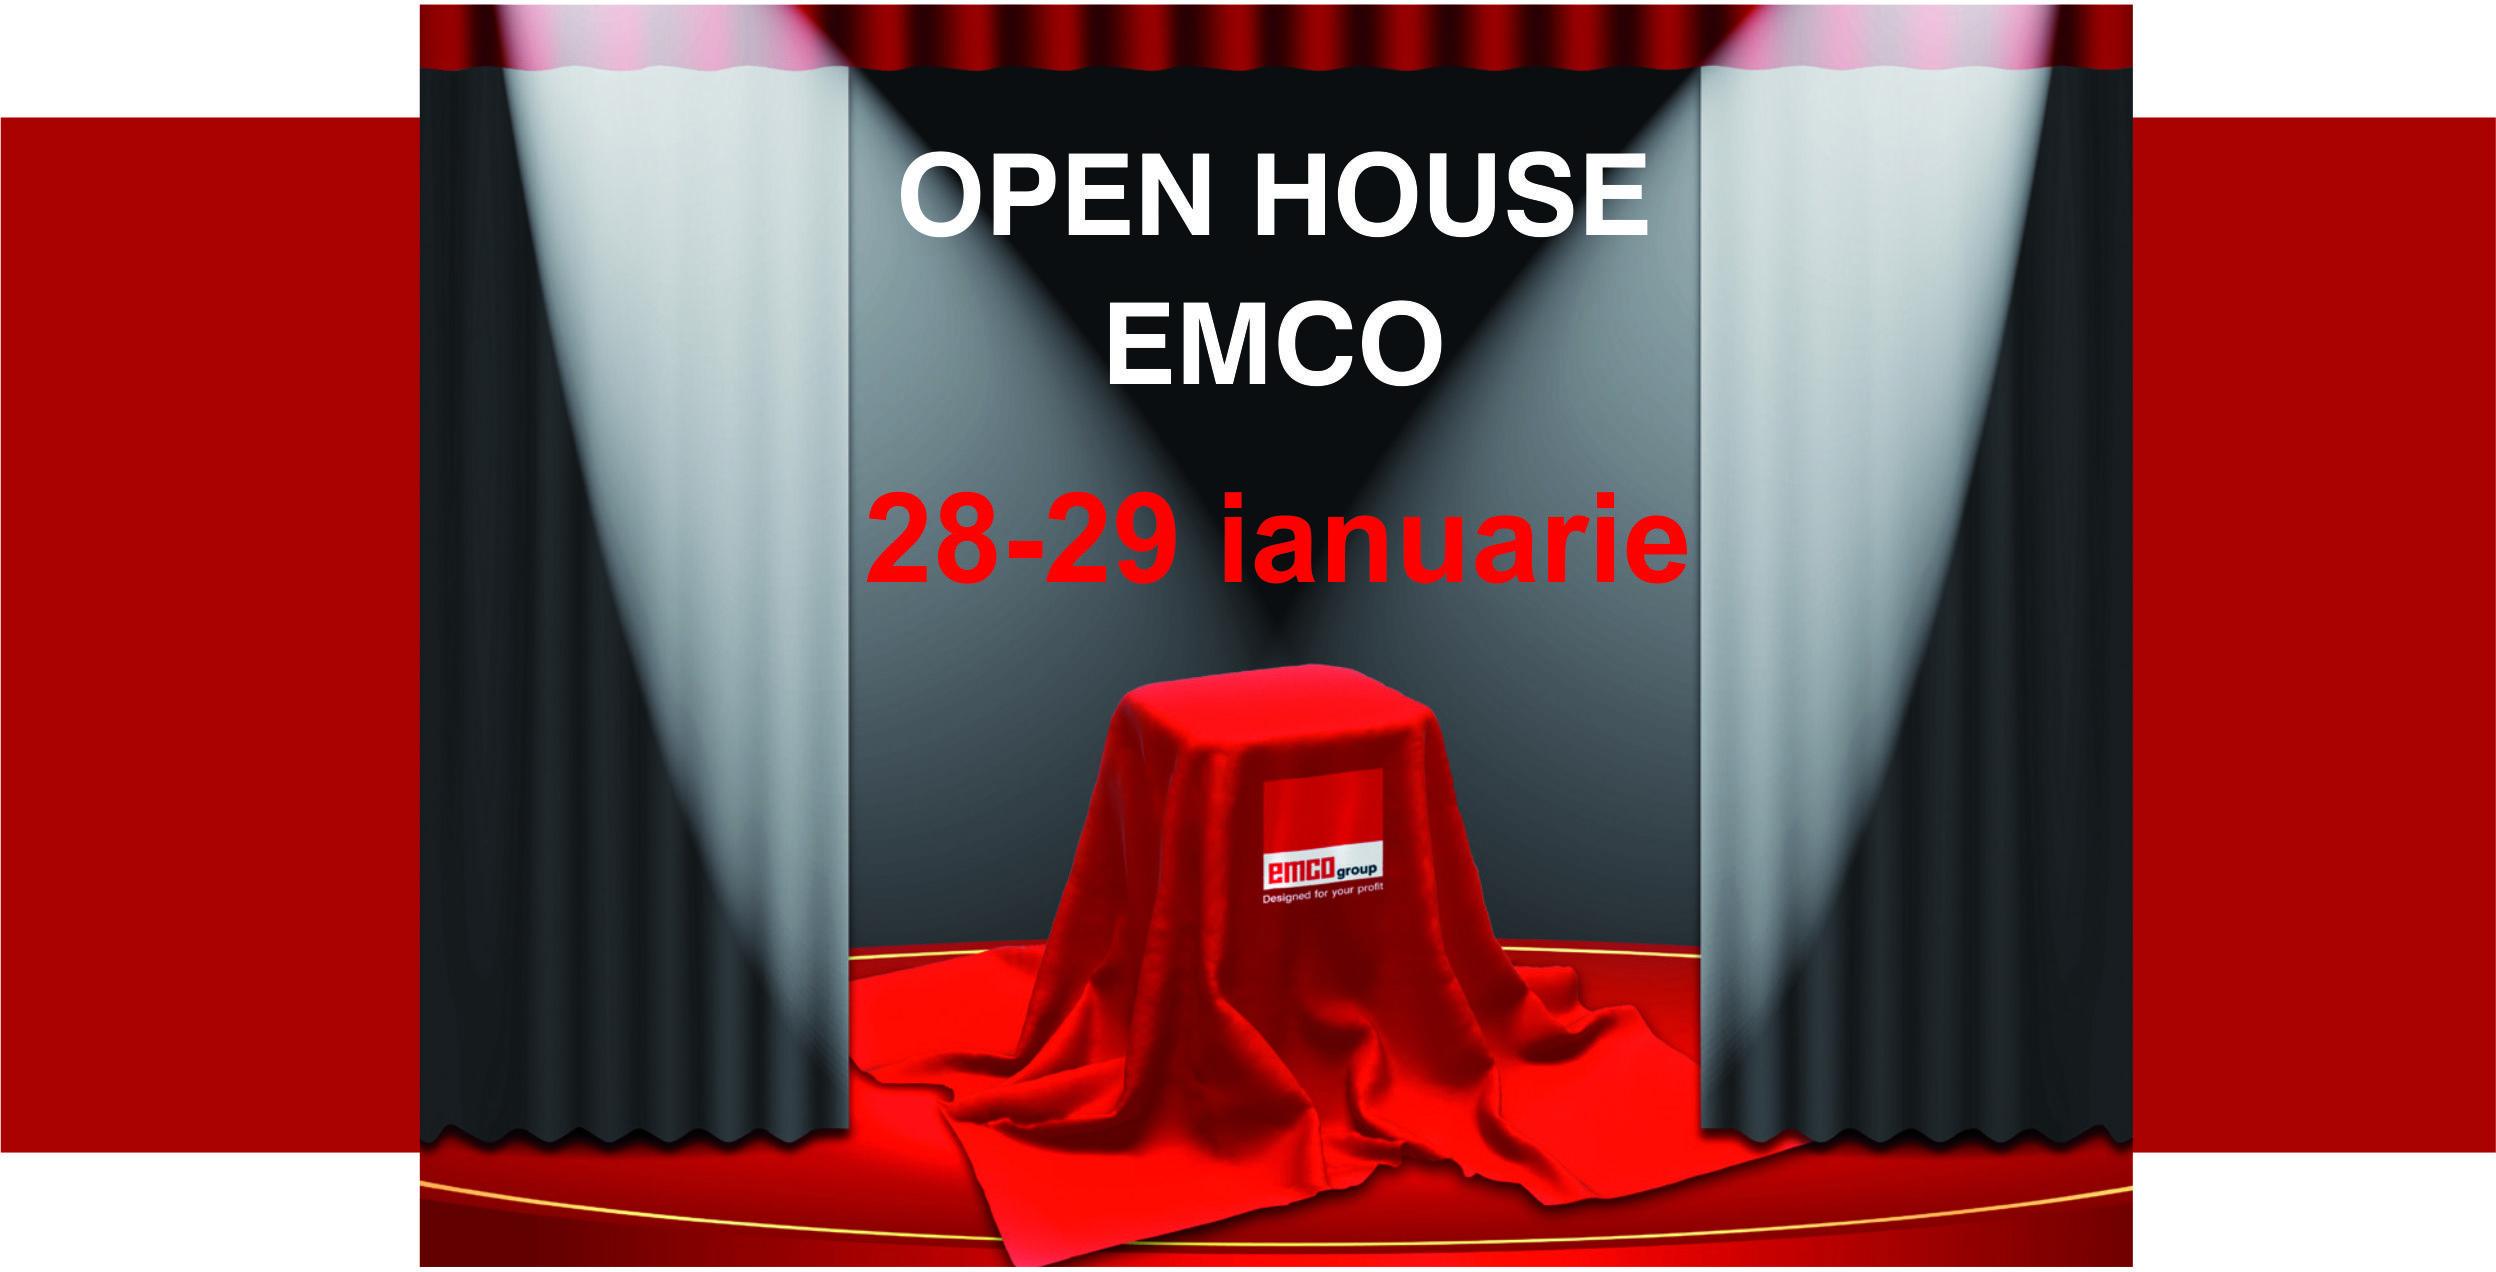 Open House EMCO